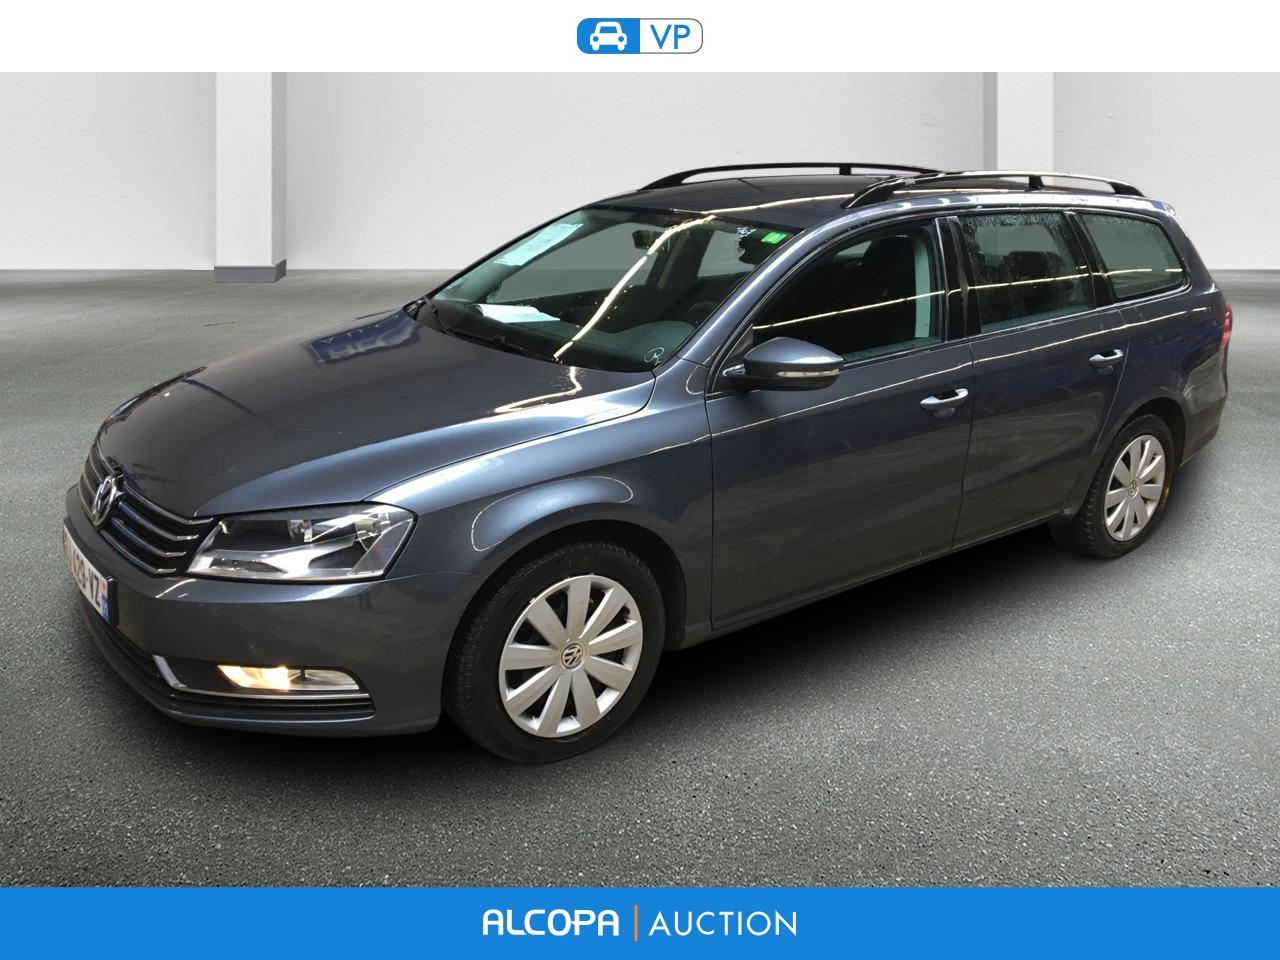 Volkswagen Passat Sw 09 2010 07 2014 Passat Sw 1 6 Tdi 105 Cr Fap Bluemotion Technology Trendline Alcopa Auction